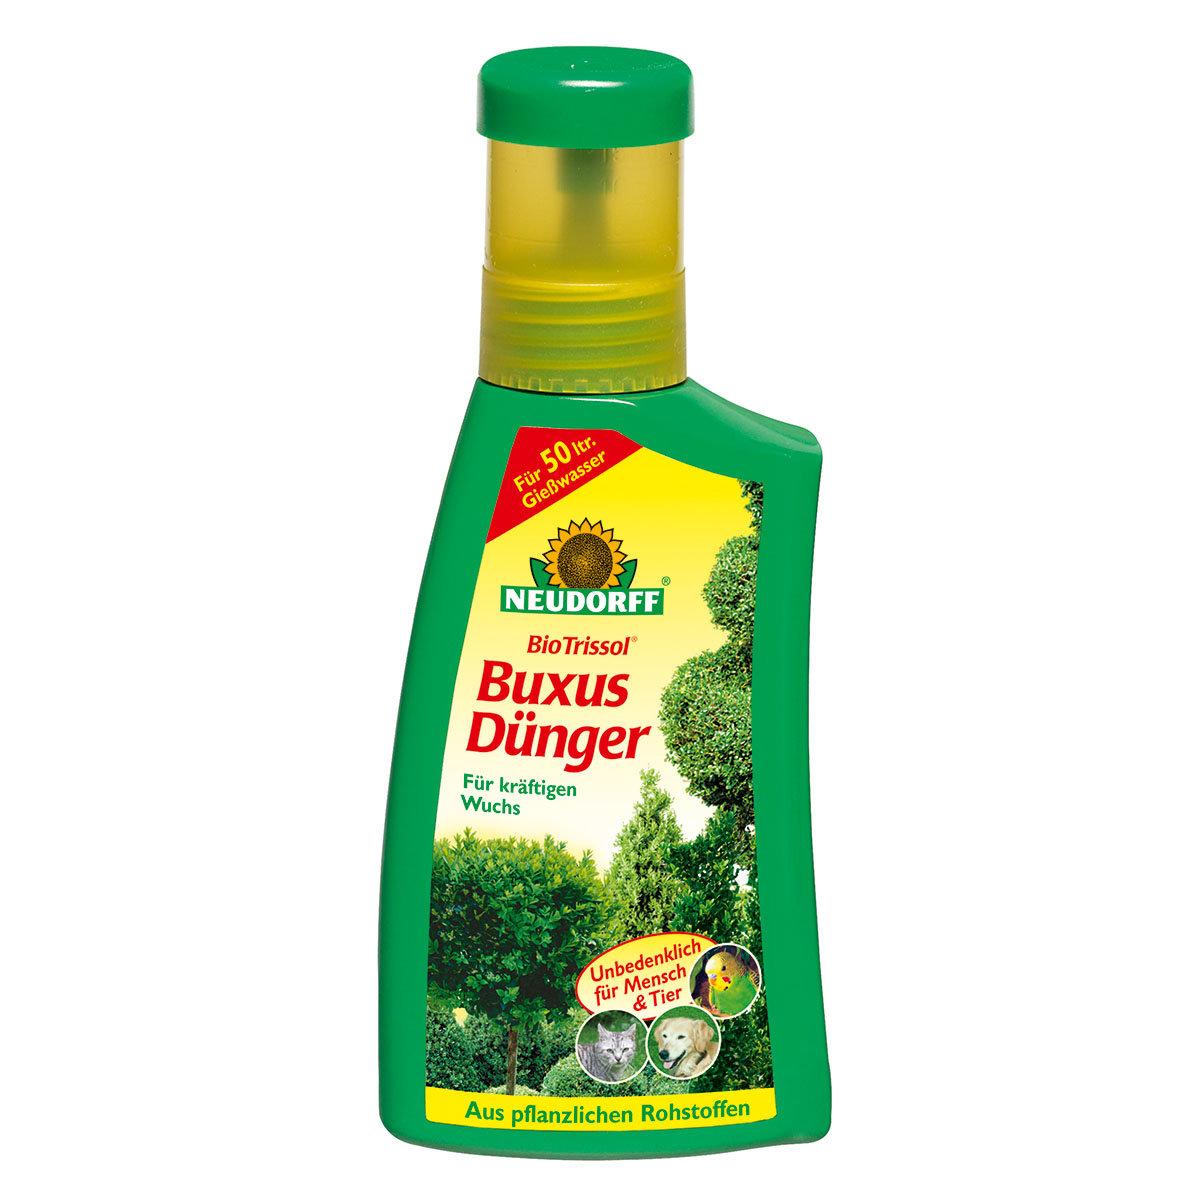 Neudorff BioTrissol BuxusDünger, 250 ml